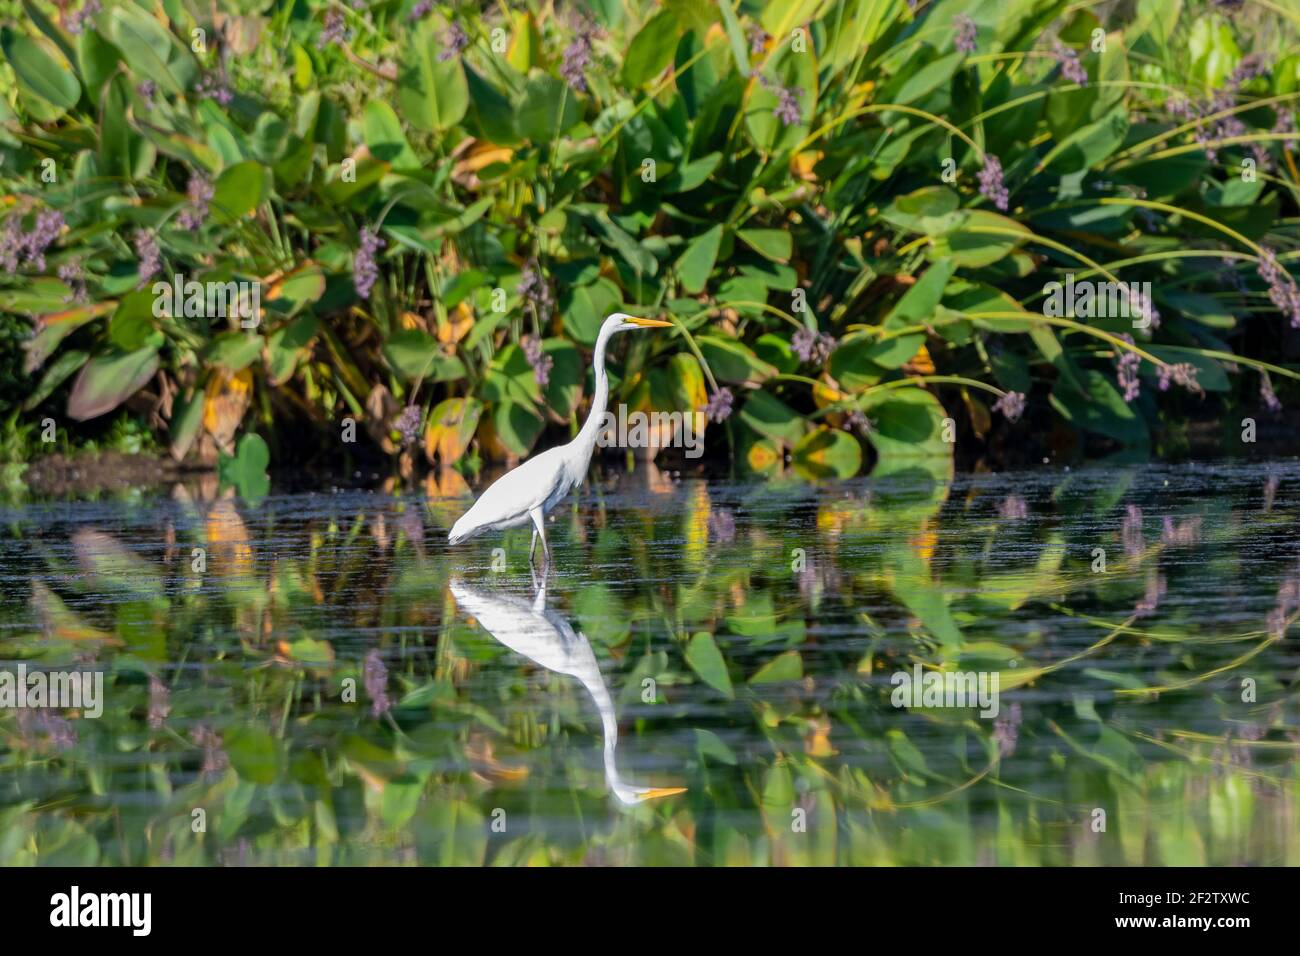 00688-03105 Grande Egret (Ardea alba) pêche près de Water Canna (Canna glauca) dans la zone humide Marion Co.il Banque D'Images